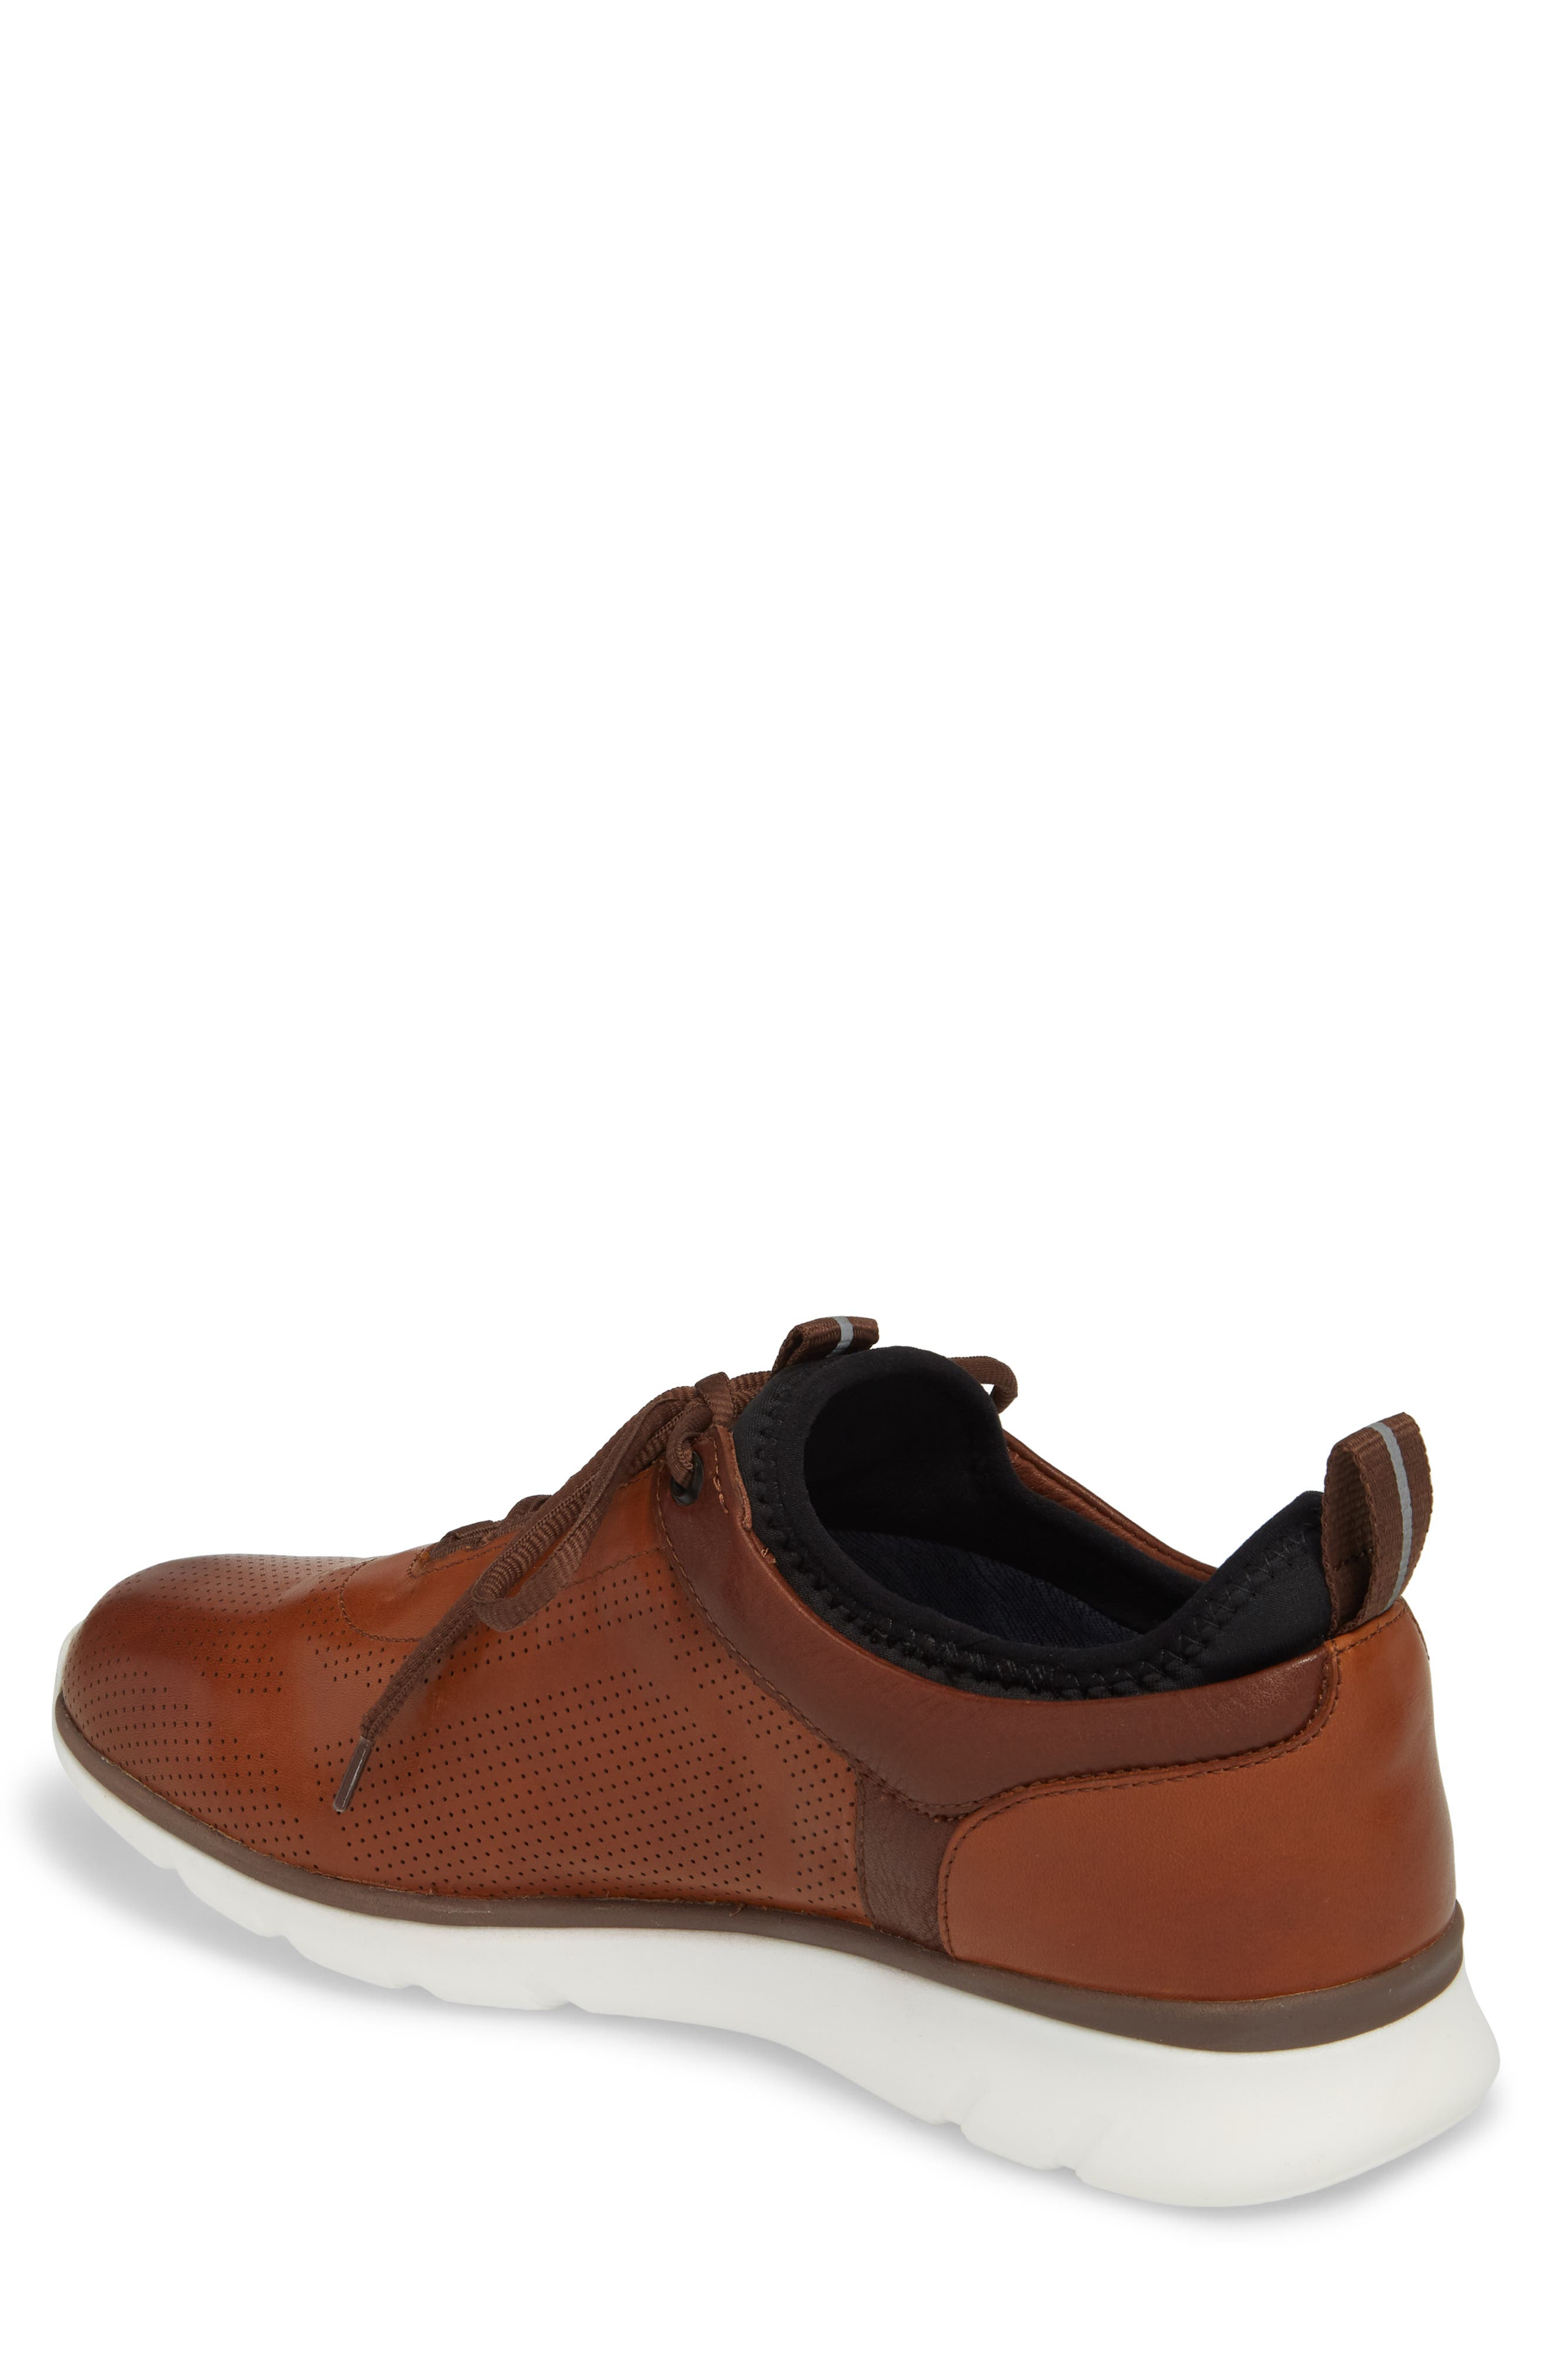 JOHNSTON & MURPHY, Prentiss XC4<sup>®</sup> Waterproof Sneaker, Alternate thumbnail 2, color, MAHOGANY LEATHER